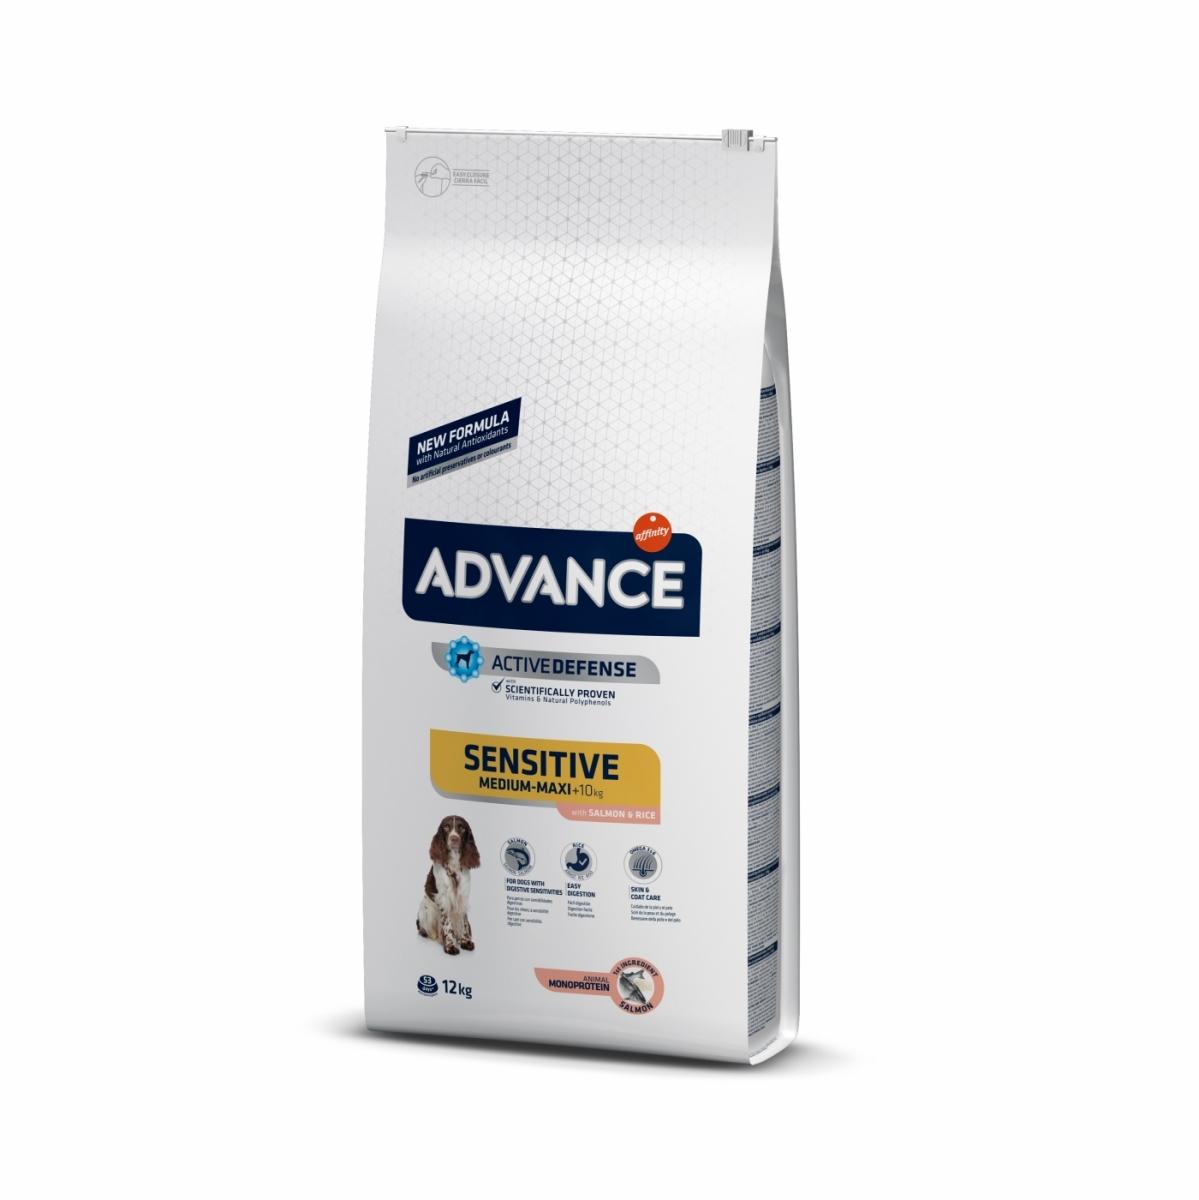 Image of Advance Adult Sensitive Medium Maxi Salmone e Riso: 3 kg